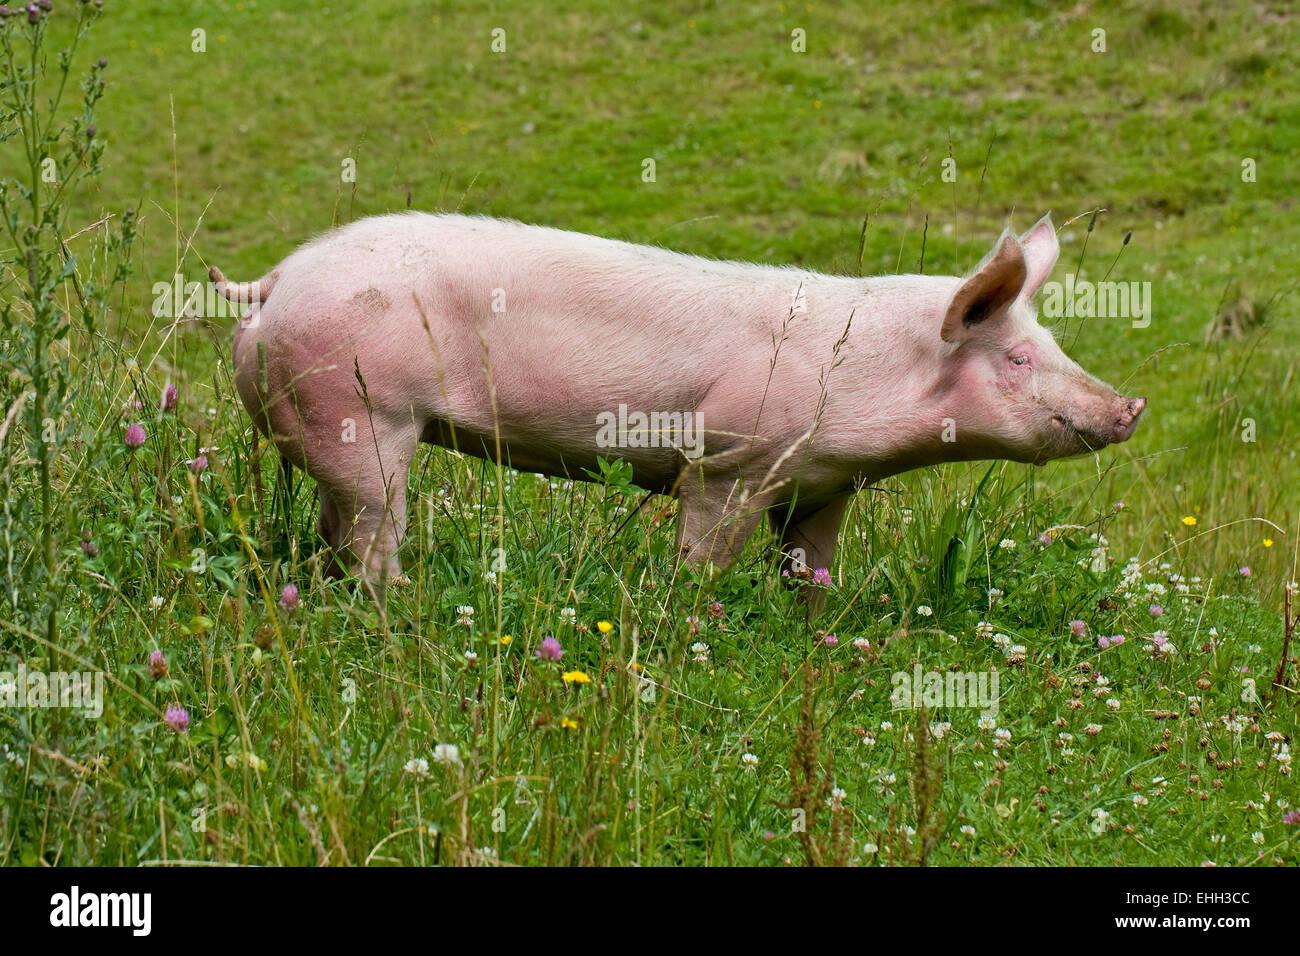 pig - Stock Image